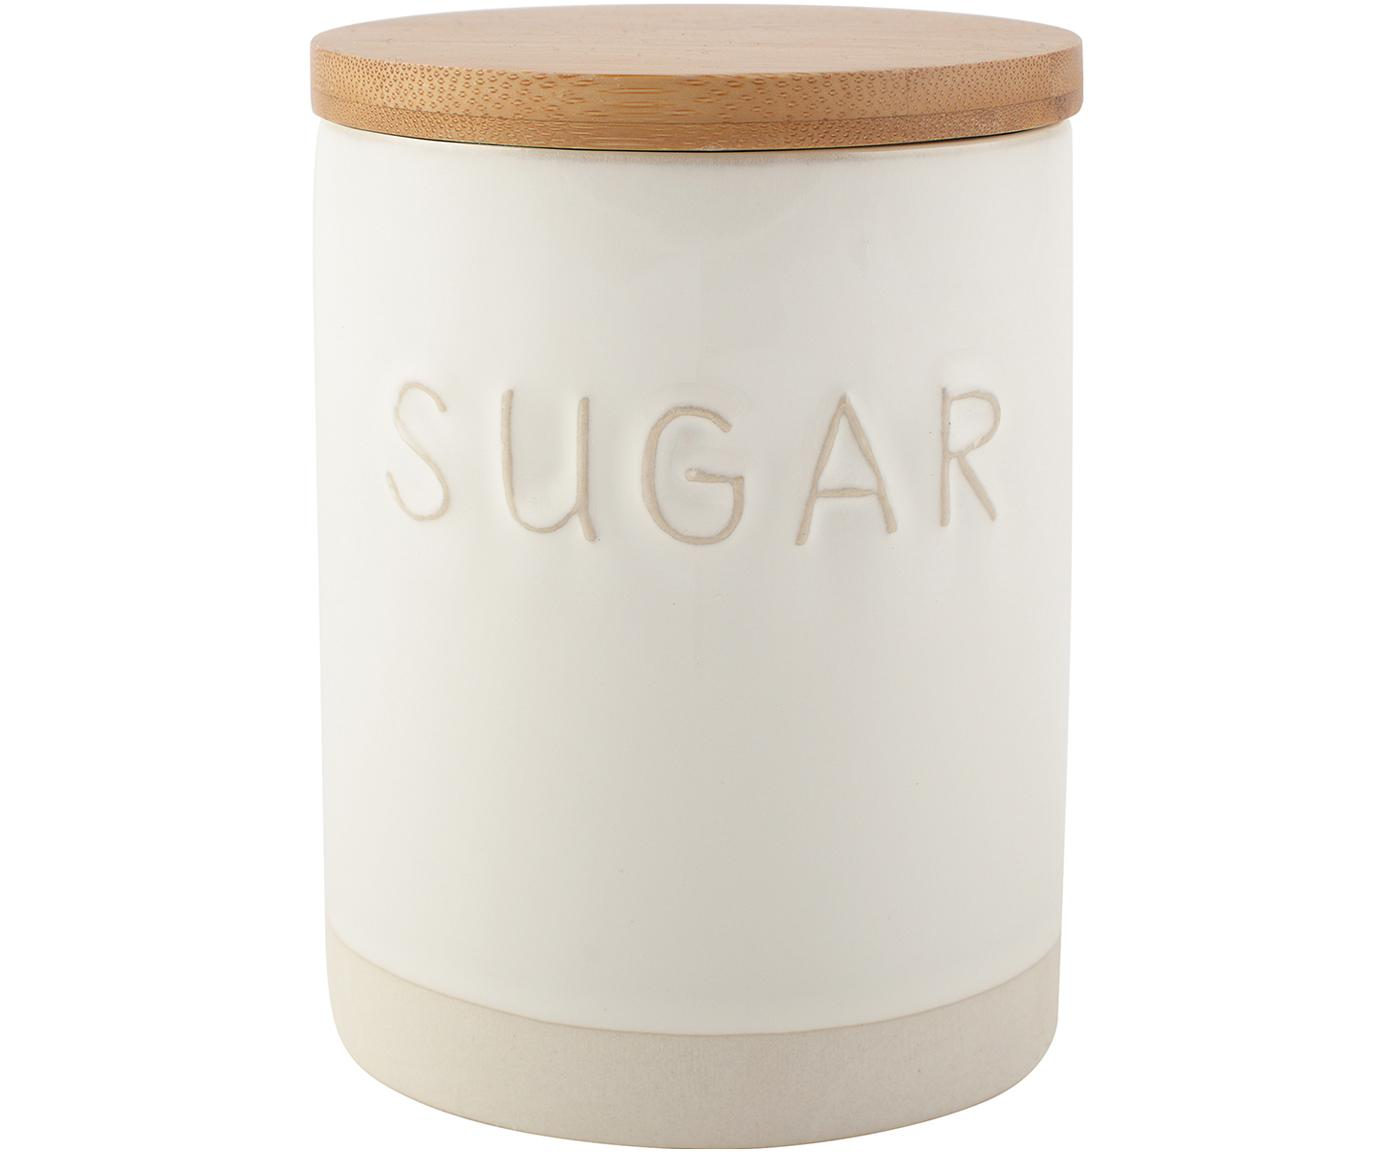 Opbergpot Sugar, Pot: keramiek, Deksel: hout, Wit, beige, Ø 10 x H 14 cm